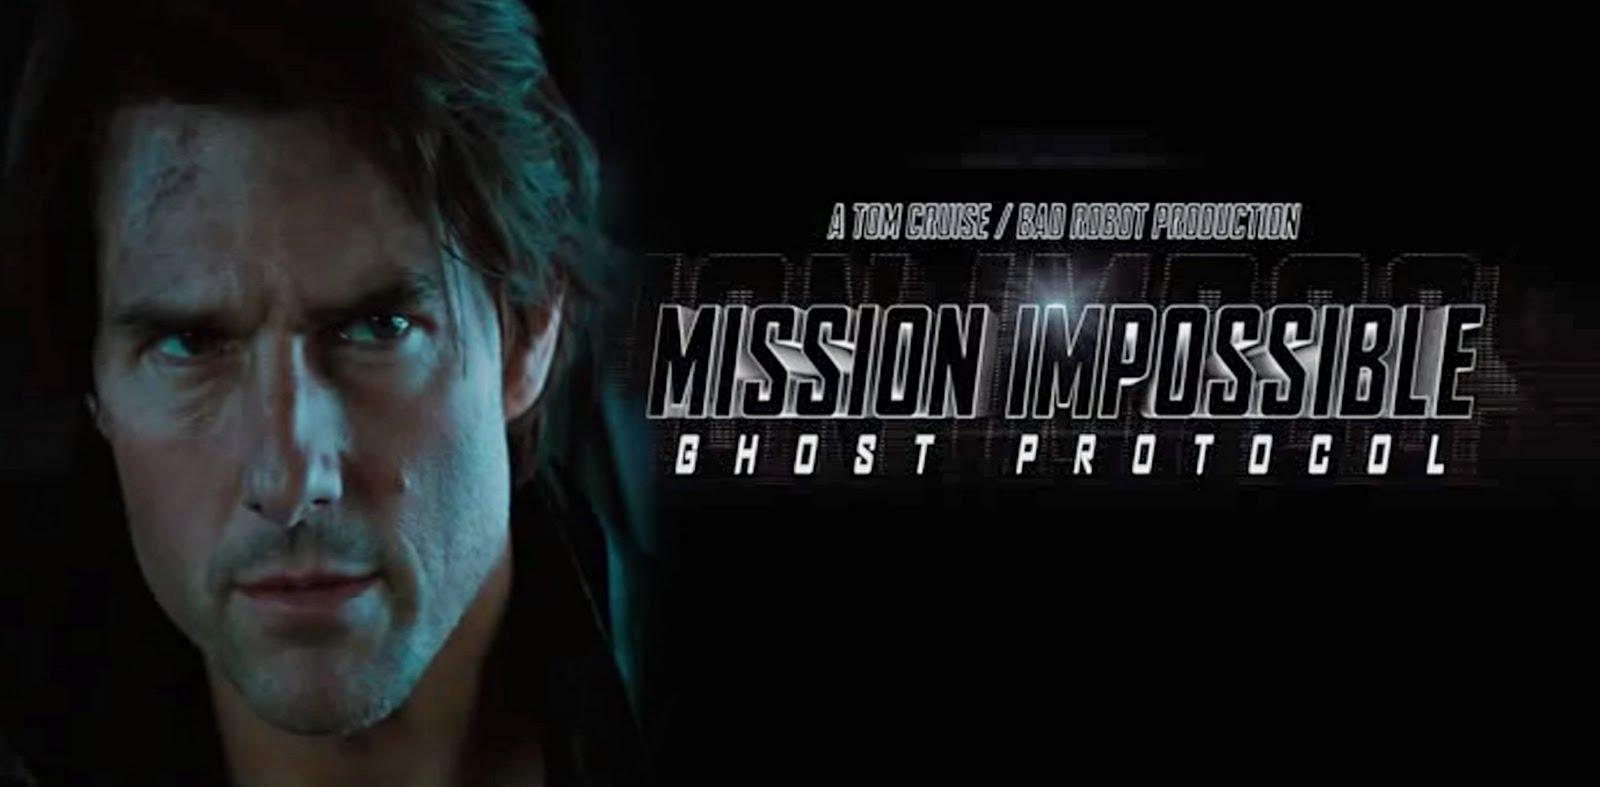 http://4.bp.blogspot.com/-TG3TpSOK-q8/Tx7AkTY2VWI/AAAAAAAAAE0/cm2gROoolXk/s1600/mission+impossible+4+ghost+protocol.jpg